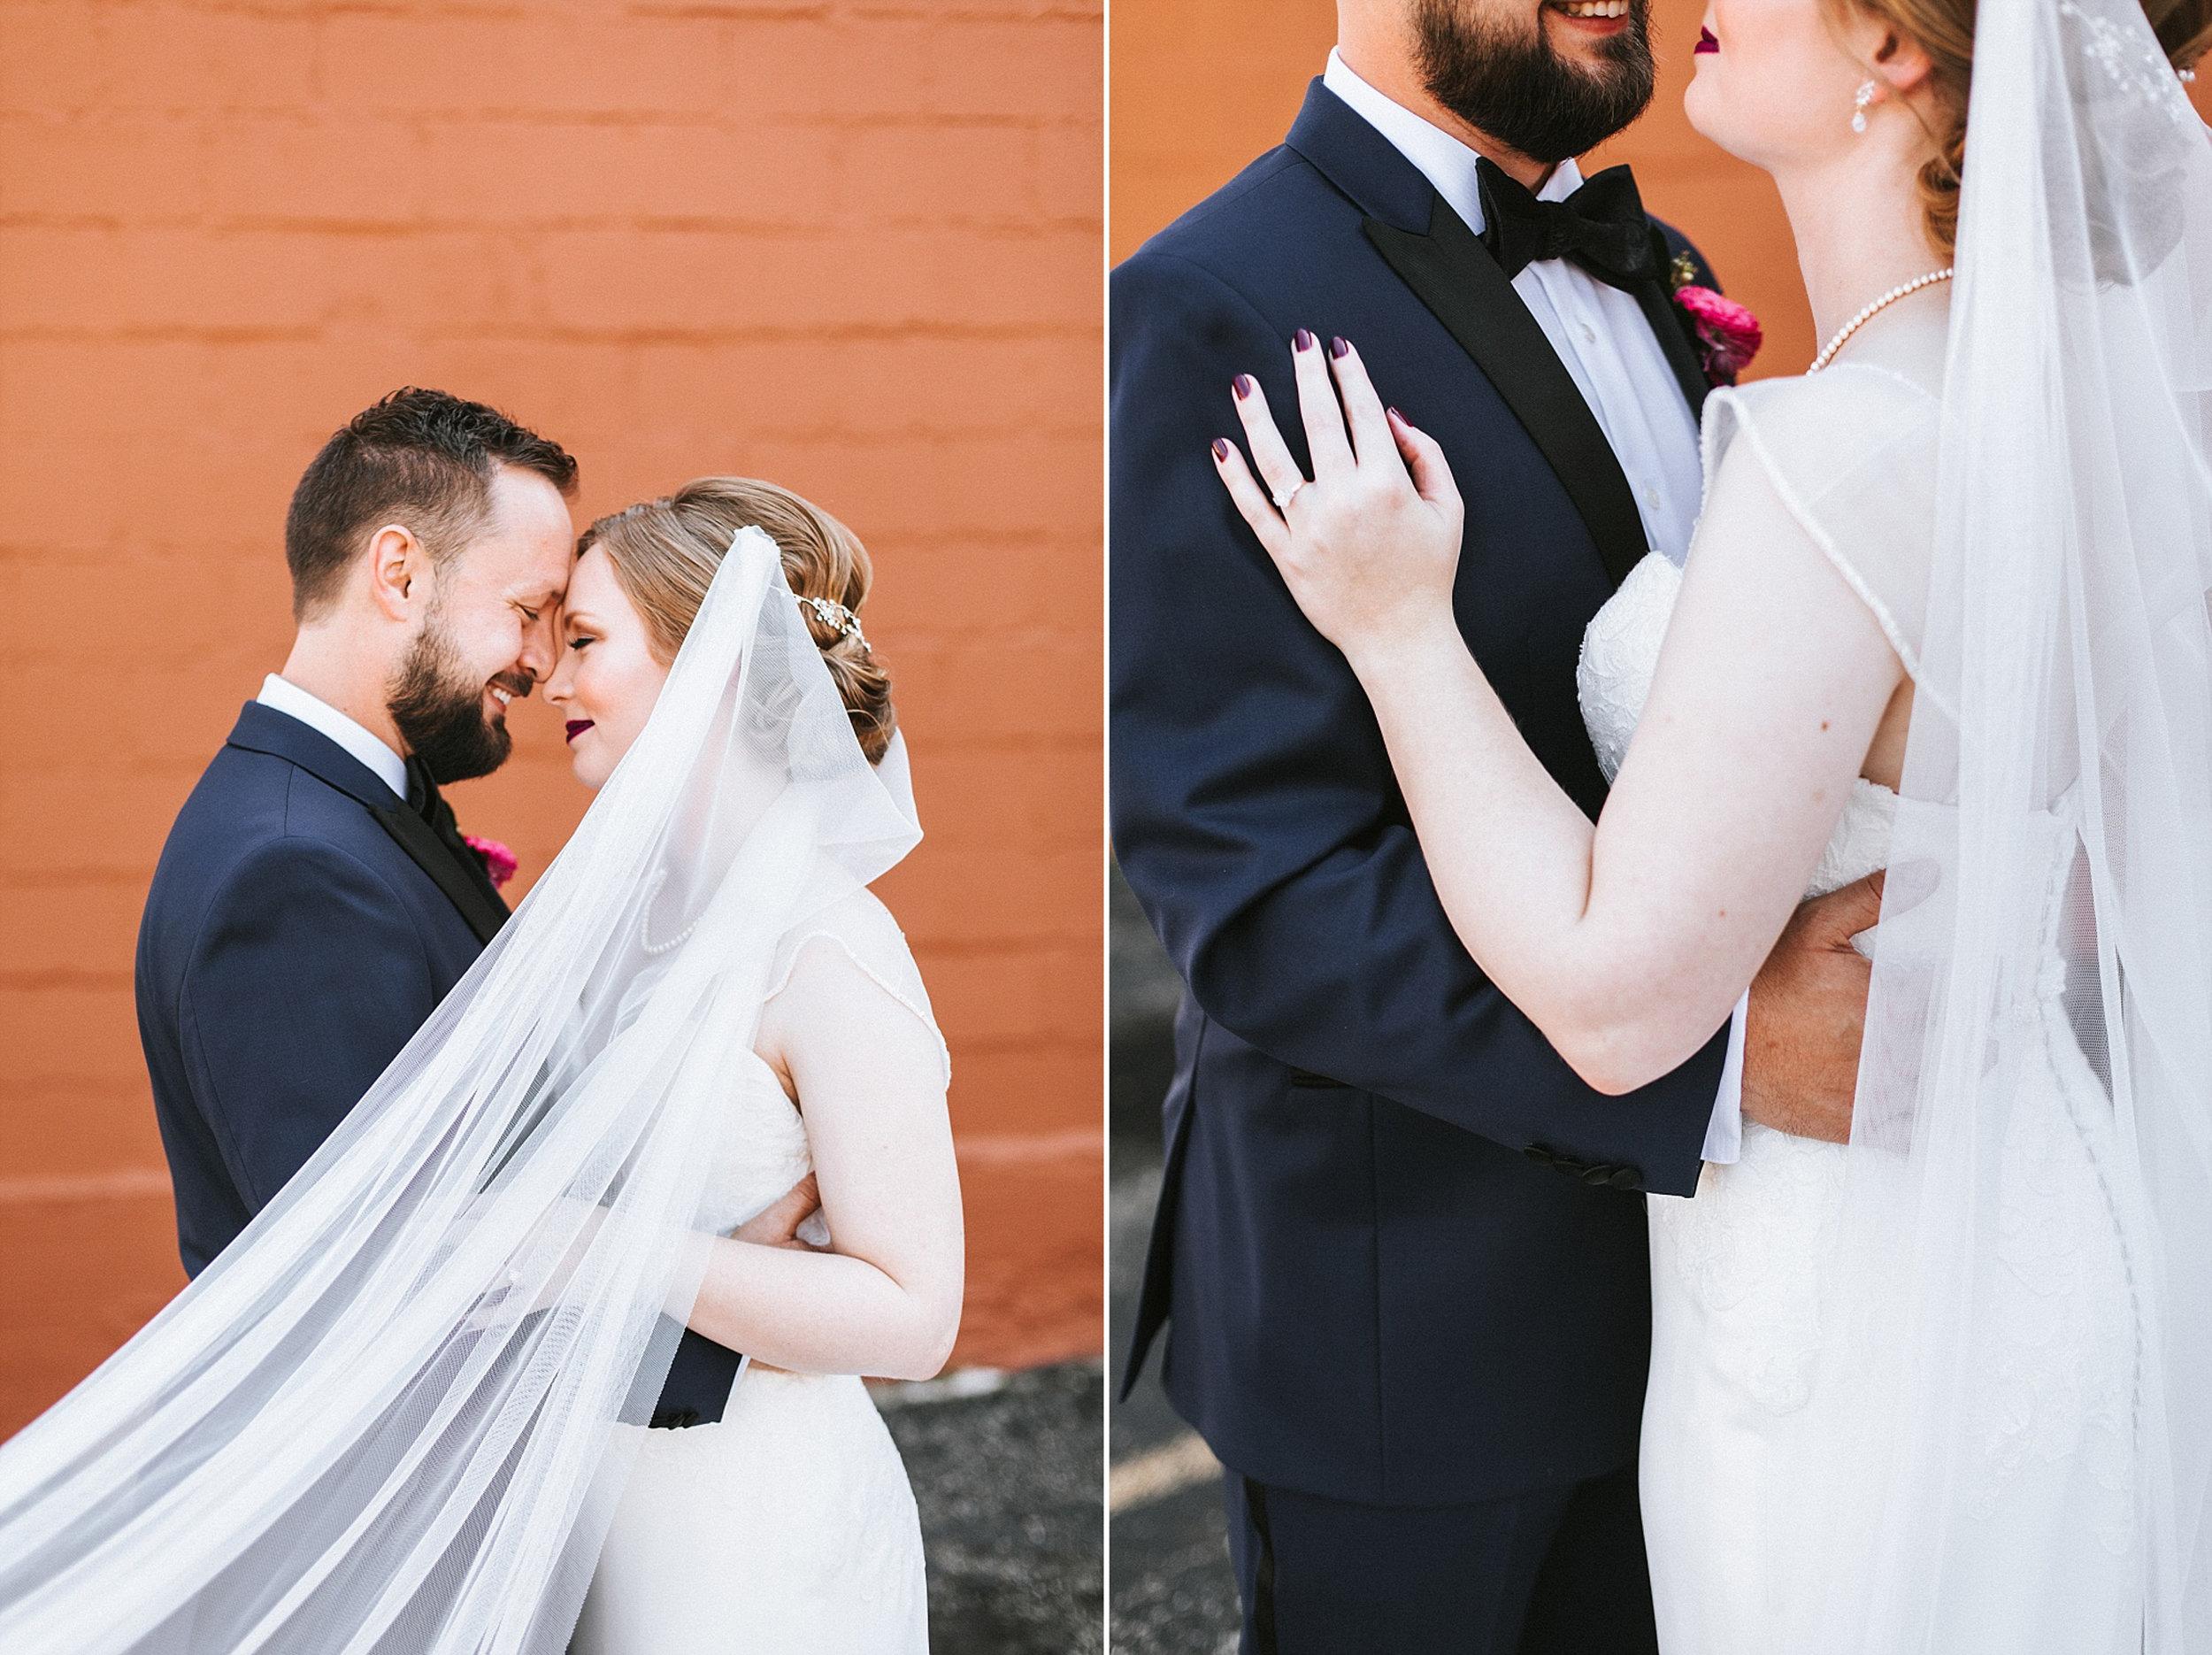 Brooke Townsend Photography - Ohio Wedding Photographer-56.jpg